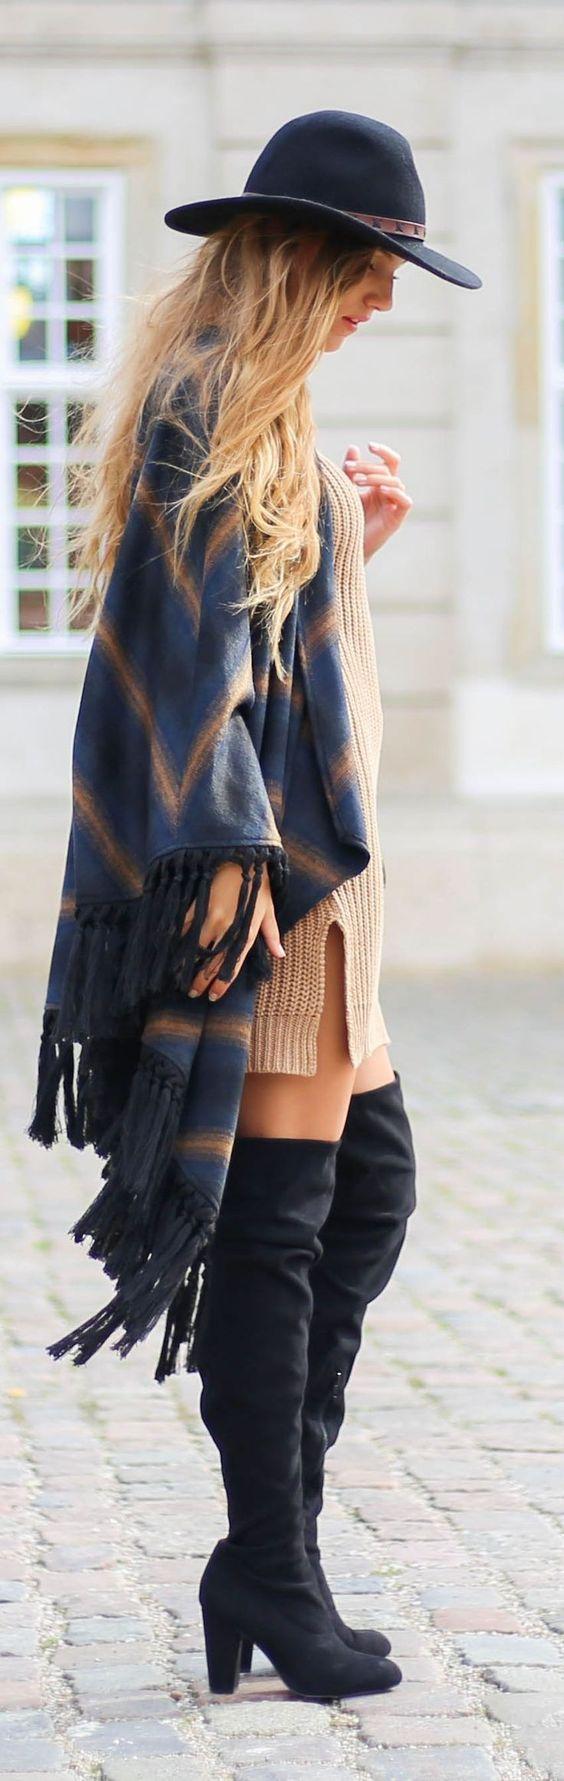 ╰☆╮Boho chic bohemian boho style hippy hippie chic bohème vibe gypsy fashion…Over the knee boots